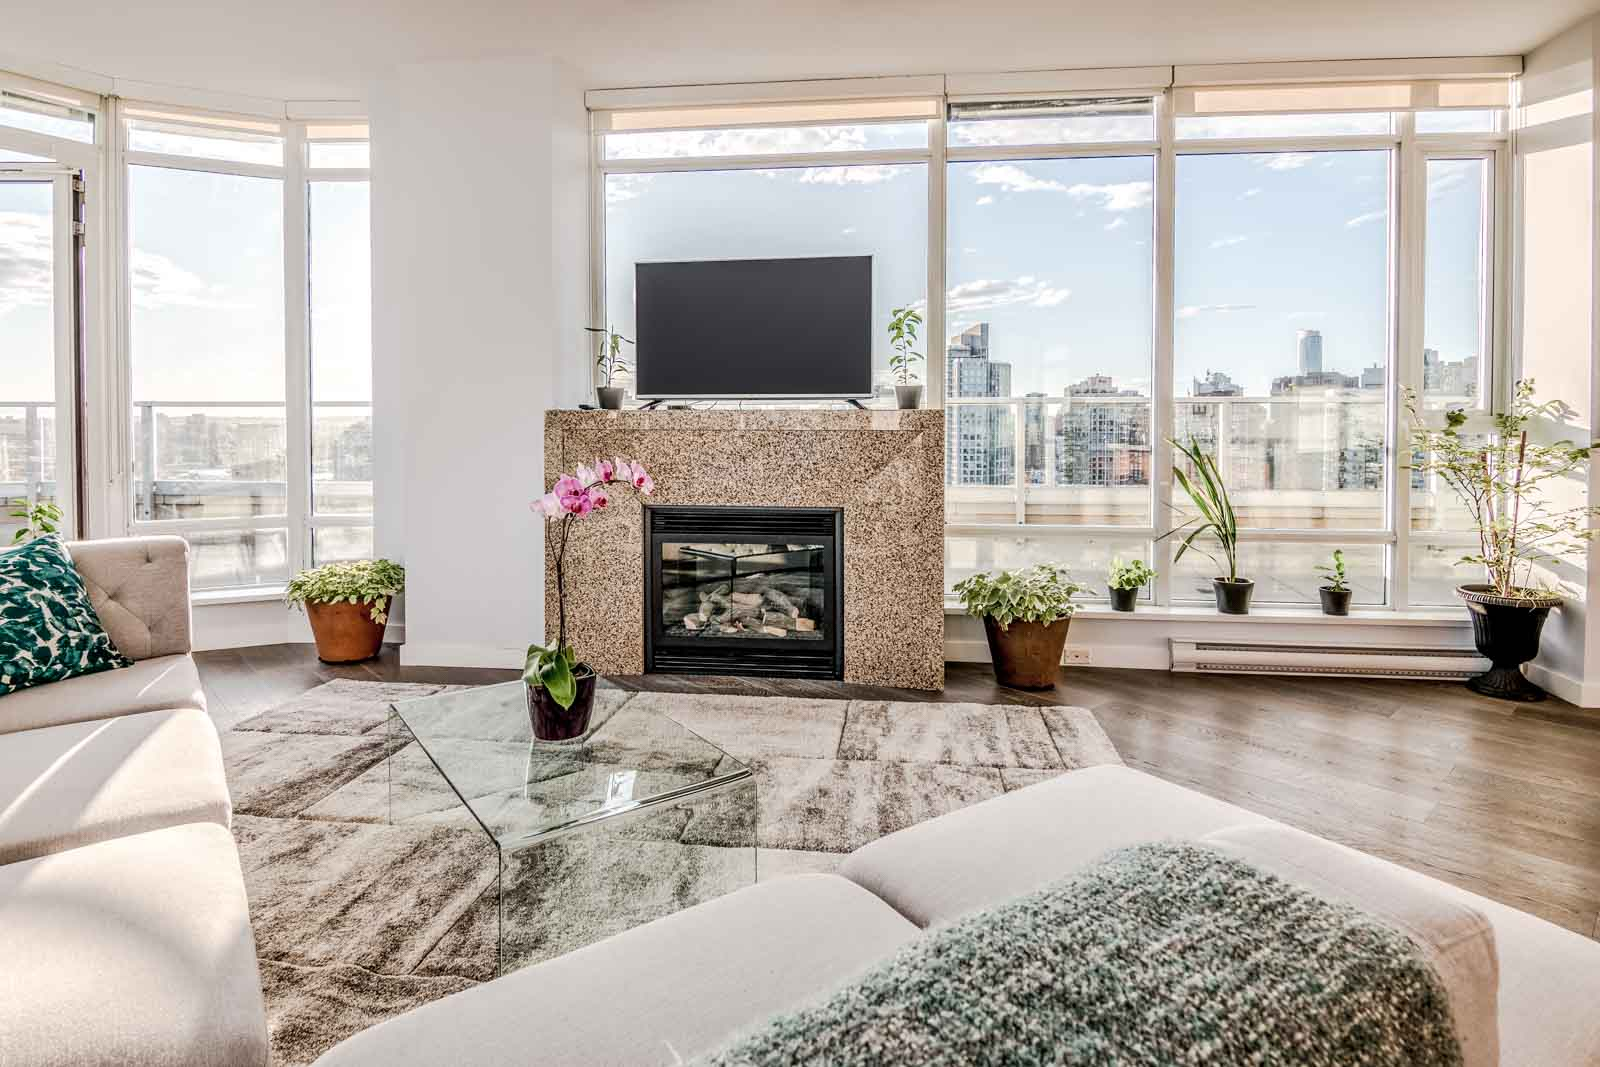 Fireplace in Olympic Village Luxury Rental